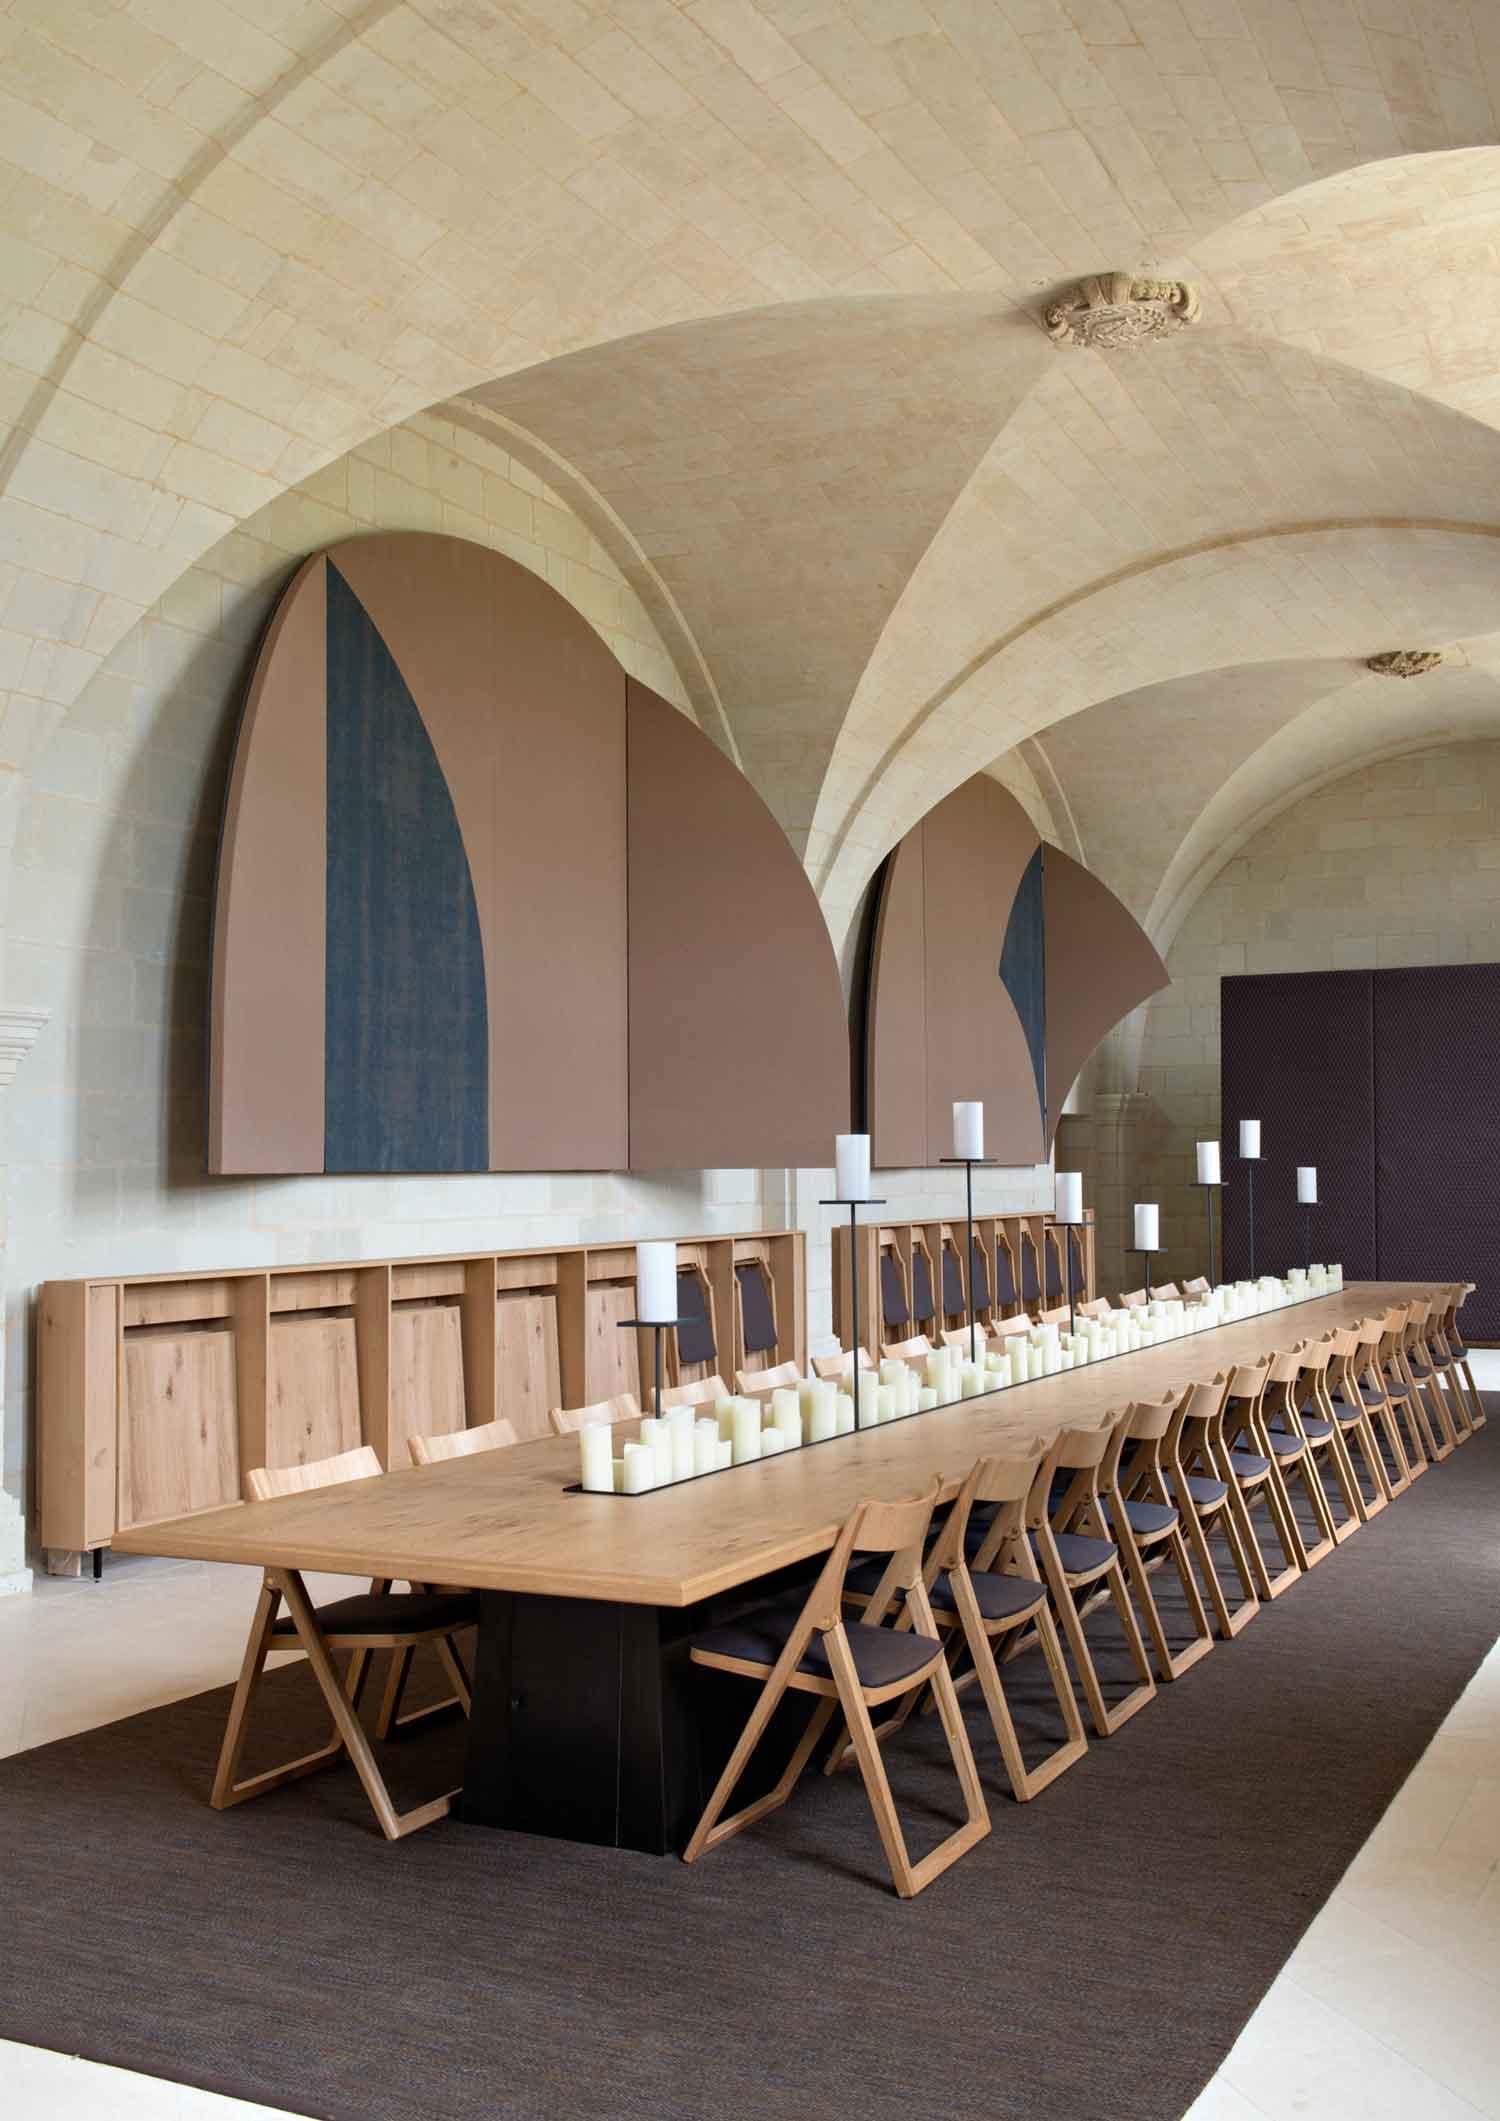 Abbaye de Fontevraud by Jouin Manku | Yellowtrace